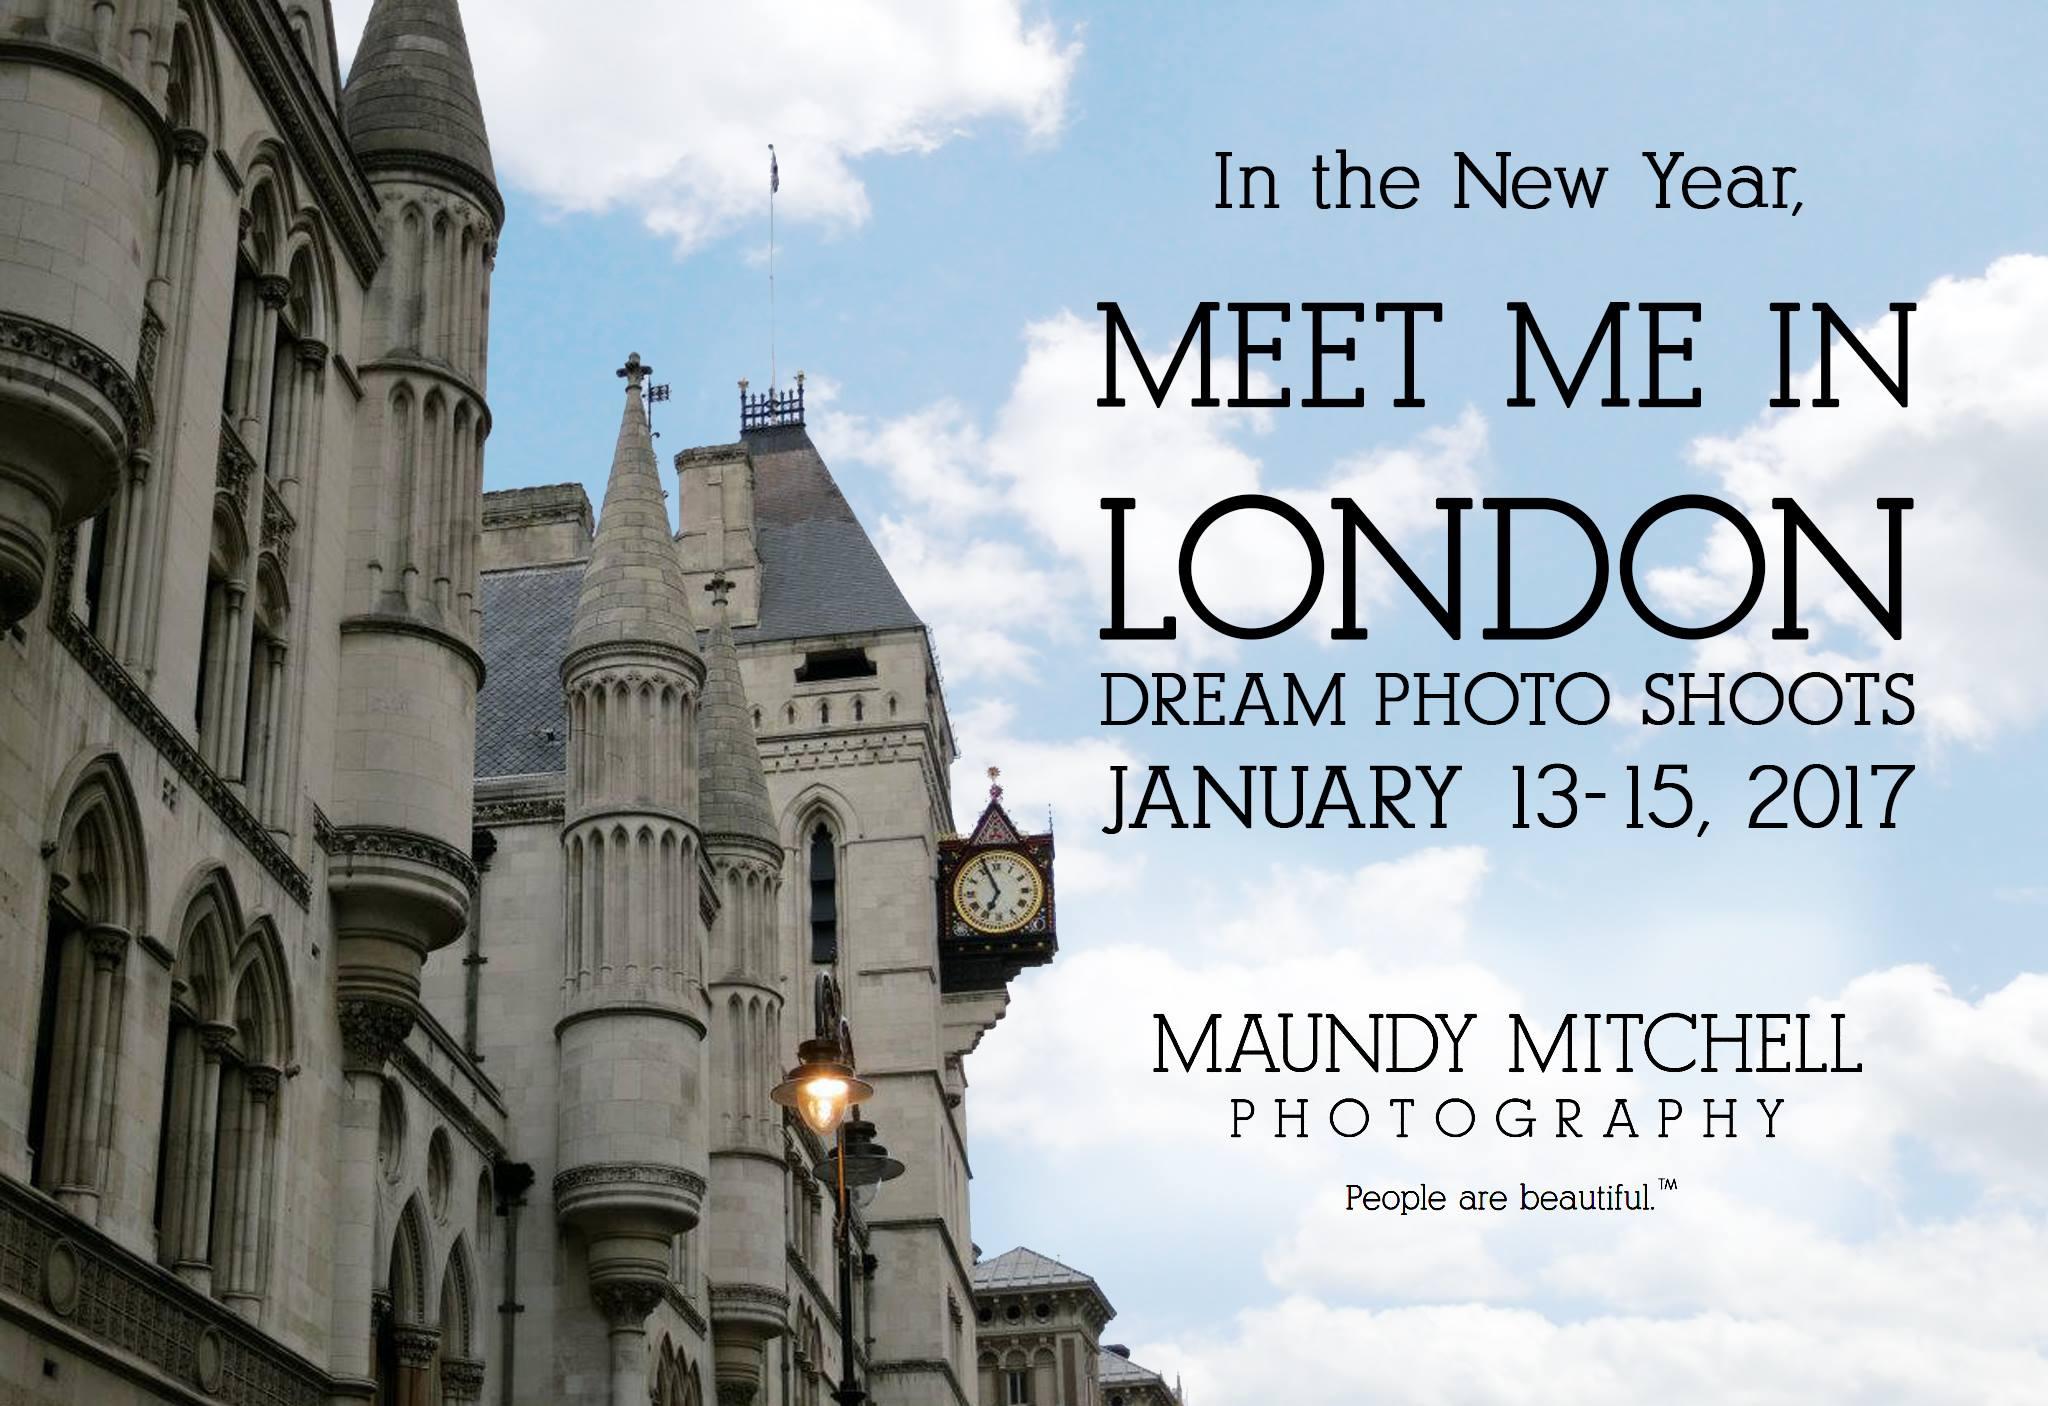 London Dream Photo Shoot 2017